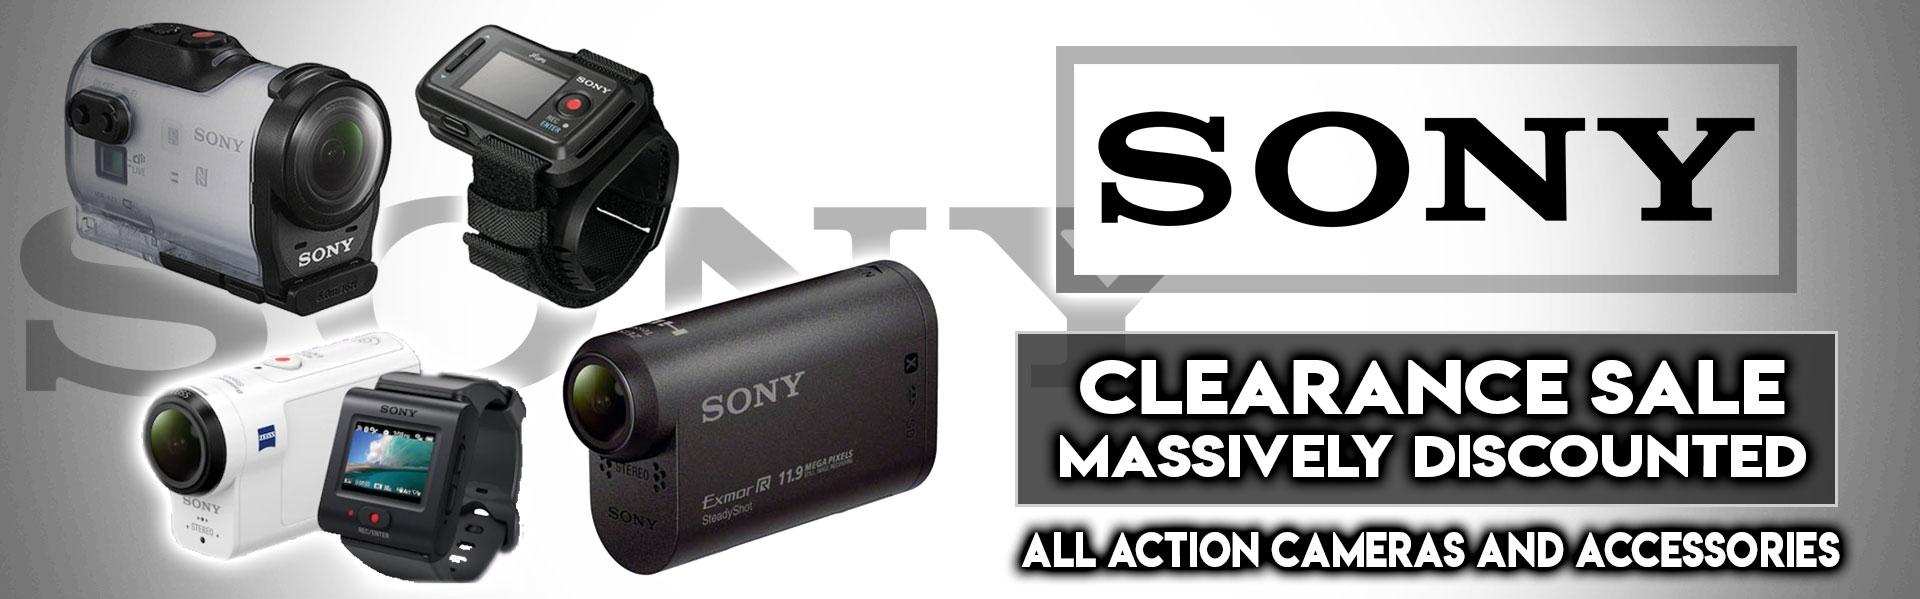 Sony Clearance